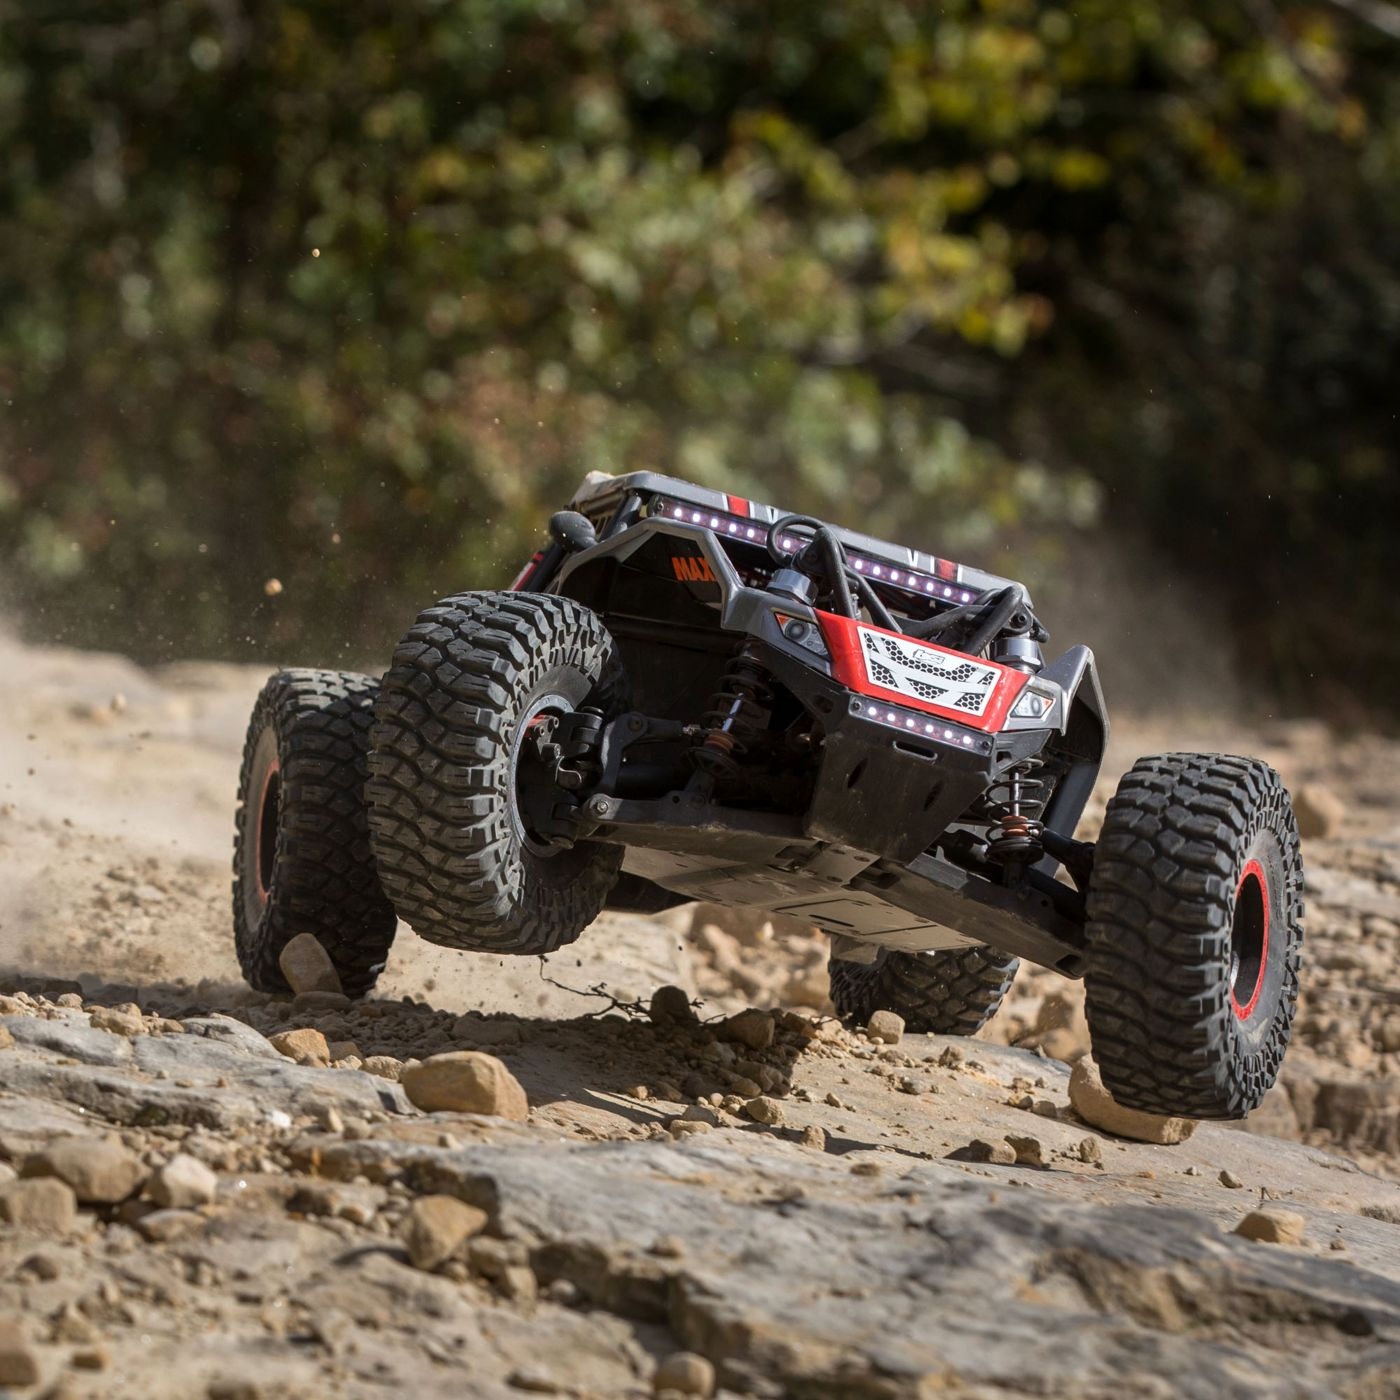 Losi Super Rock Rey Rock Racer brushless avc rtr 2